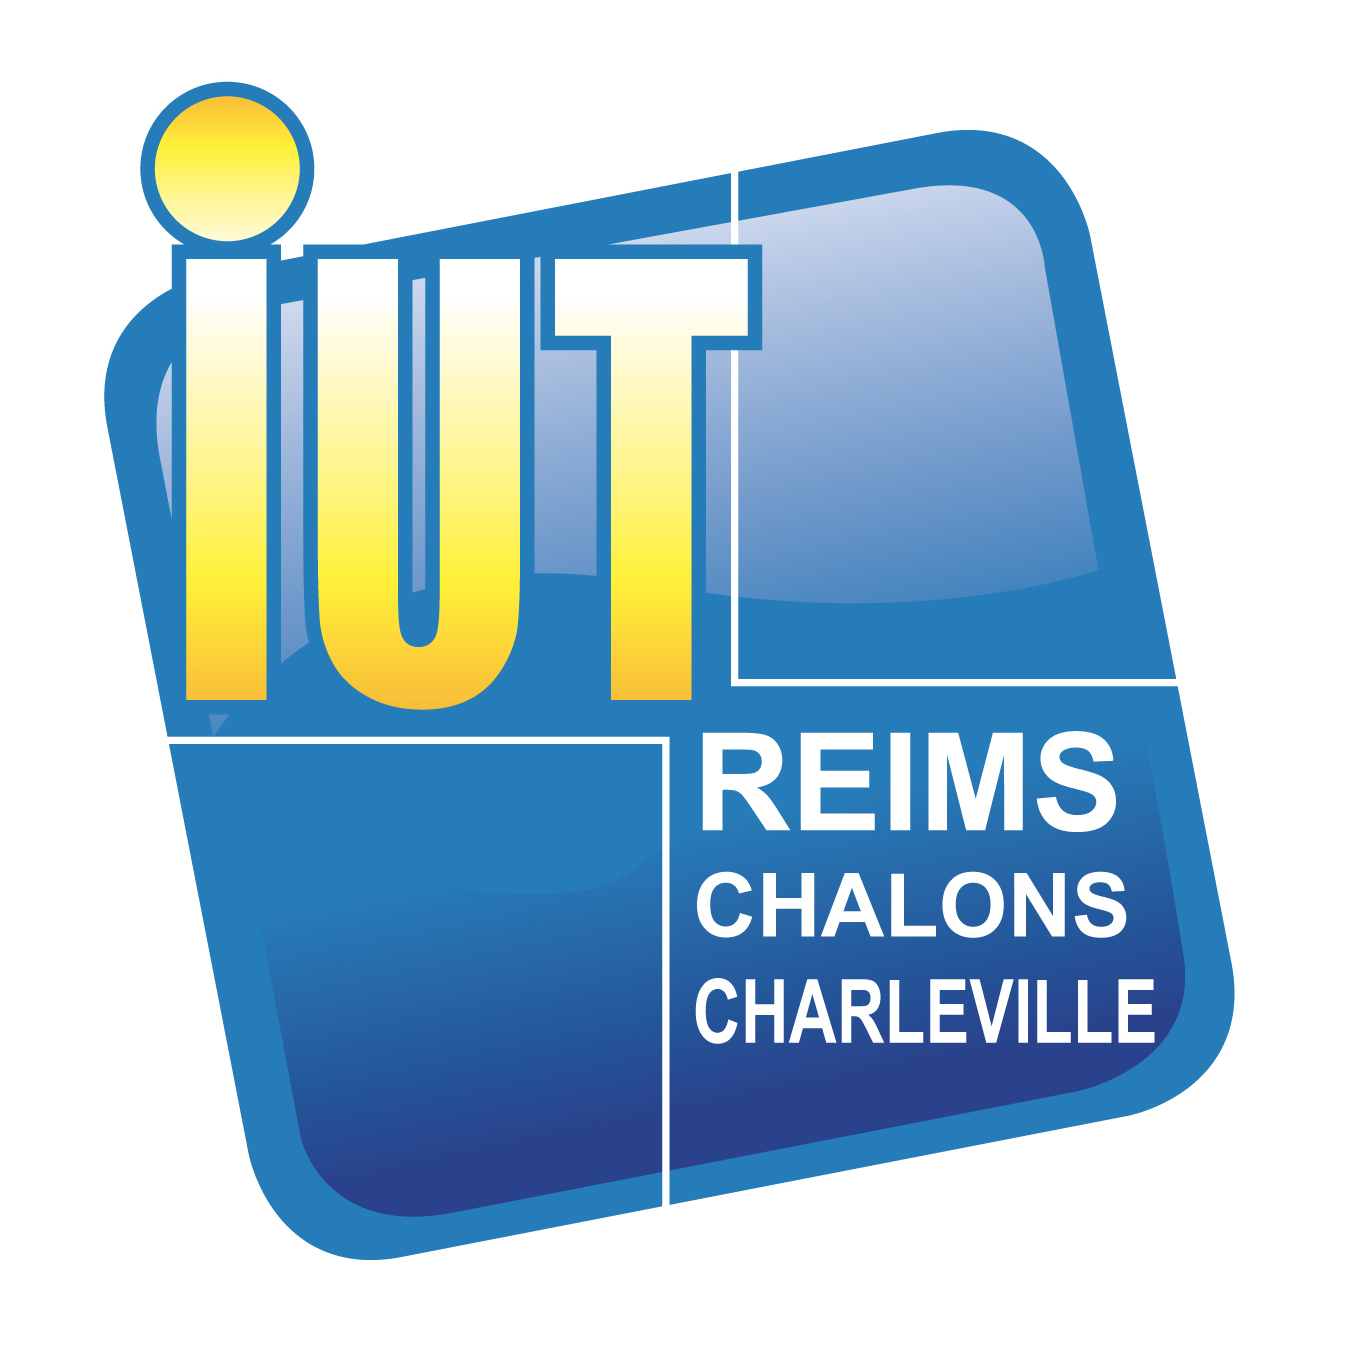 logo_IUT_retenu_jdc.jpg